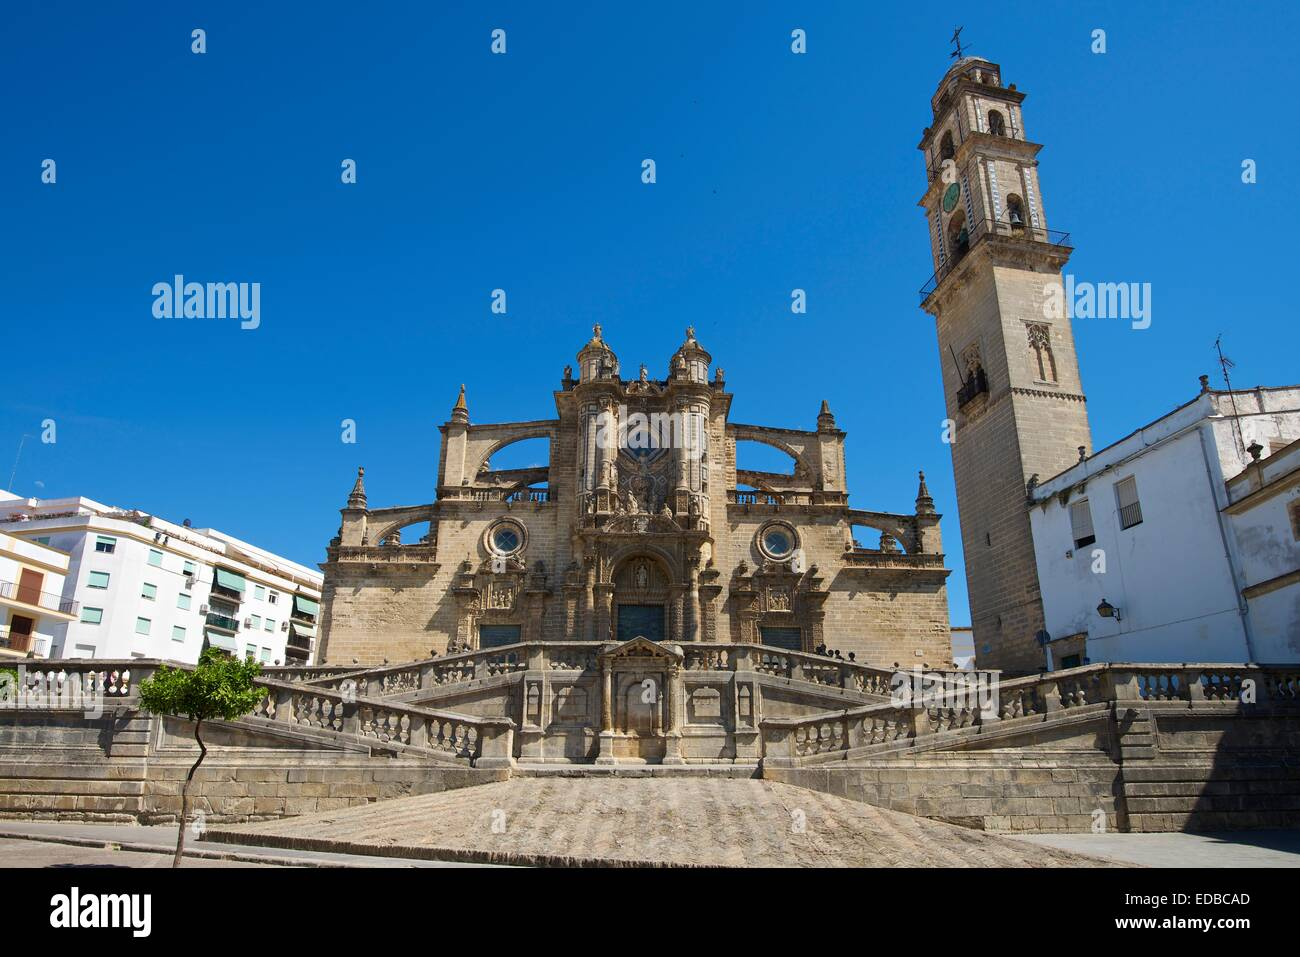 Kathedrale La Colegiata del Salvador, Jerez De La Frontera, Andalusien, Spanien Stockbild